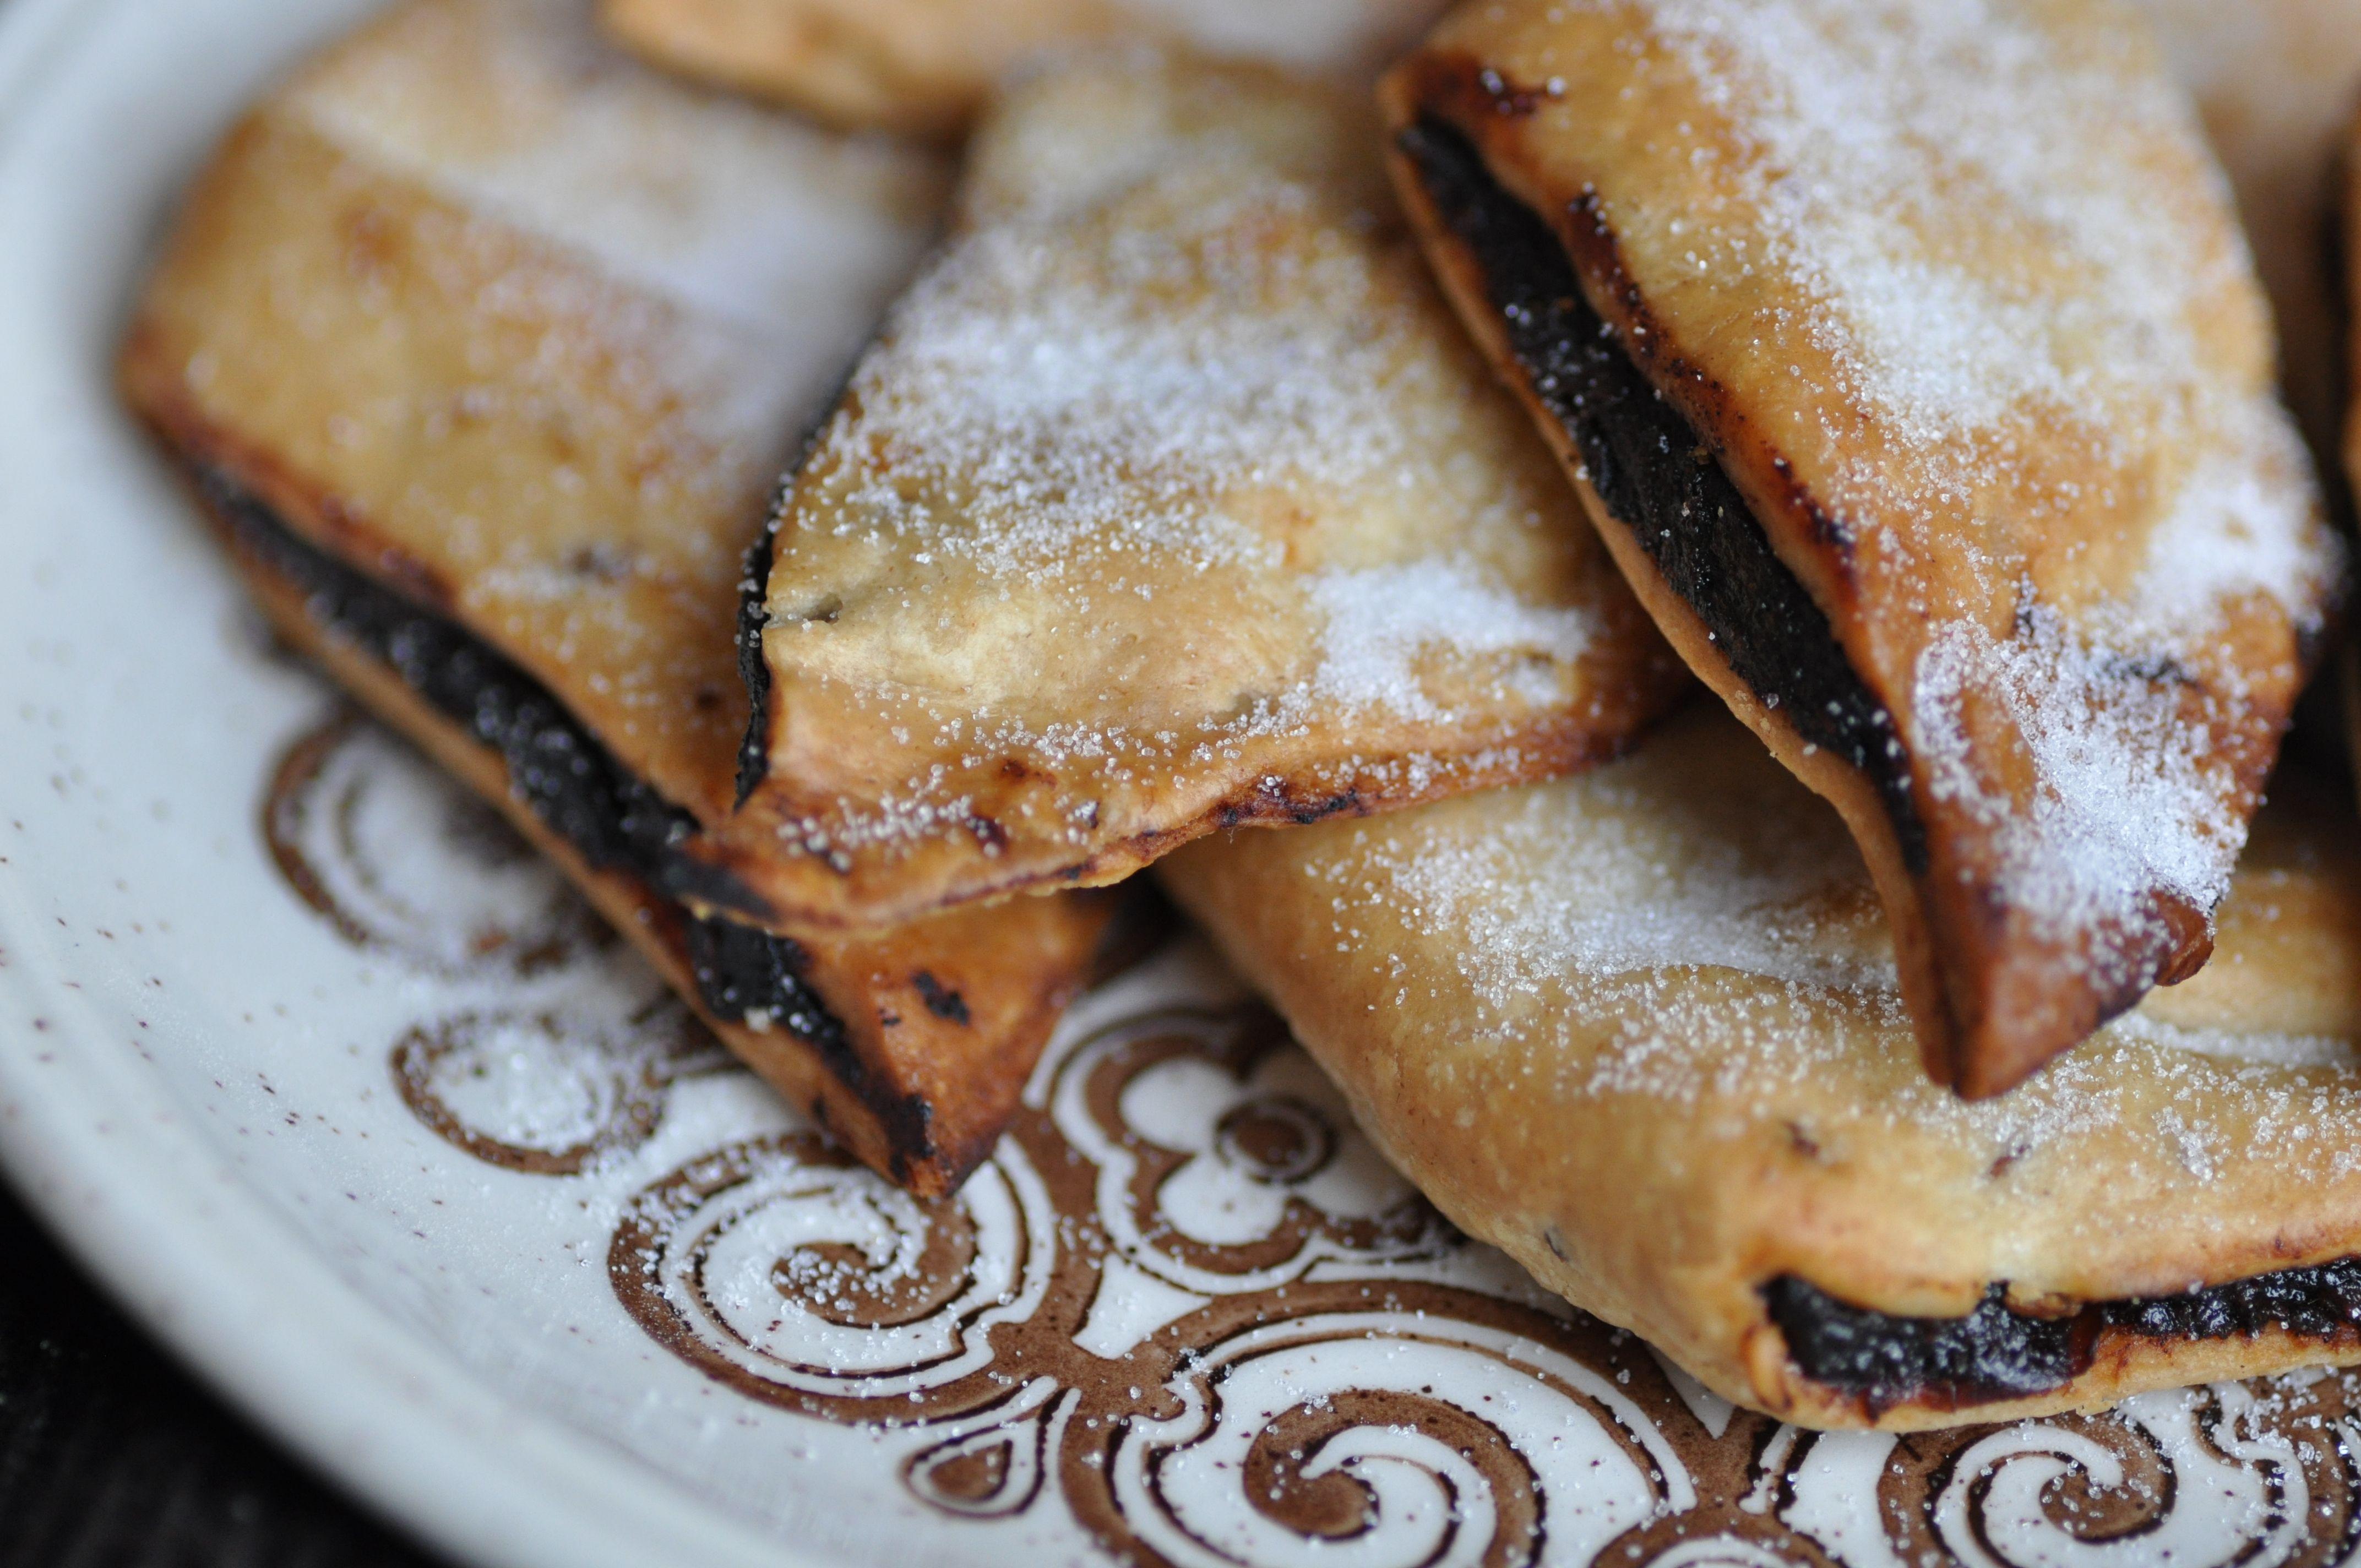 Imqaret Diamond Date Filled Pastries A Maltese Mouthful Recipe Maltese Recipes Malta Food Food